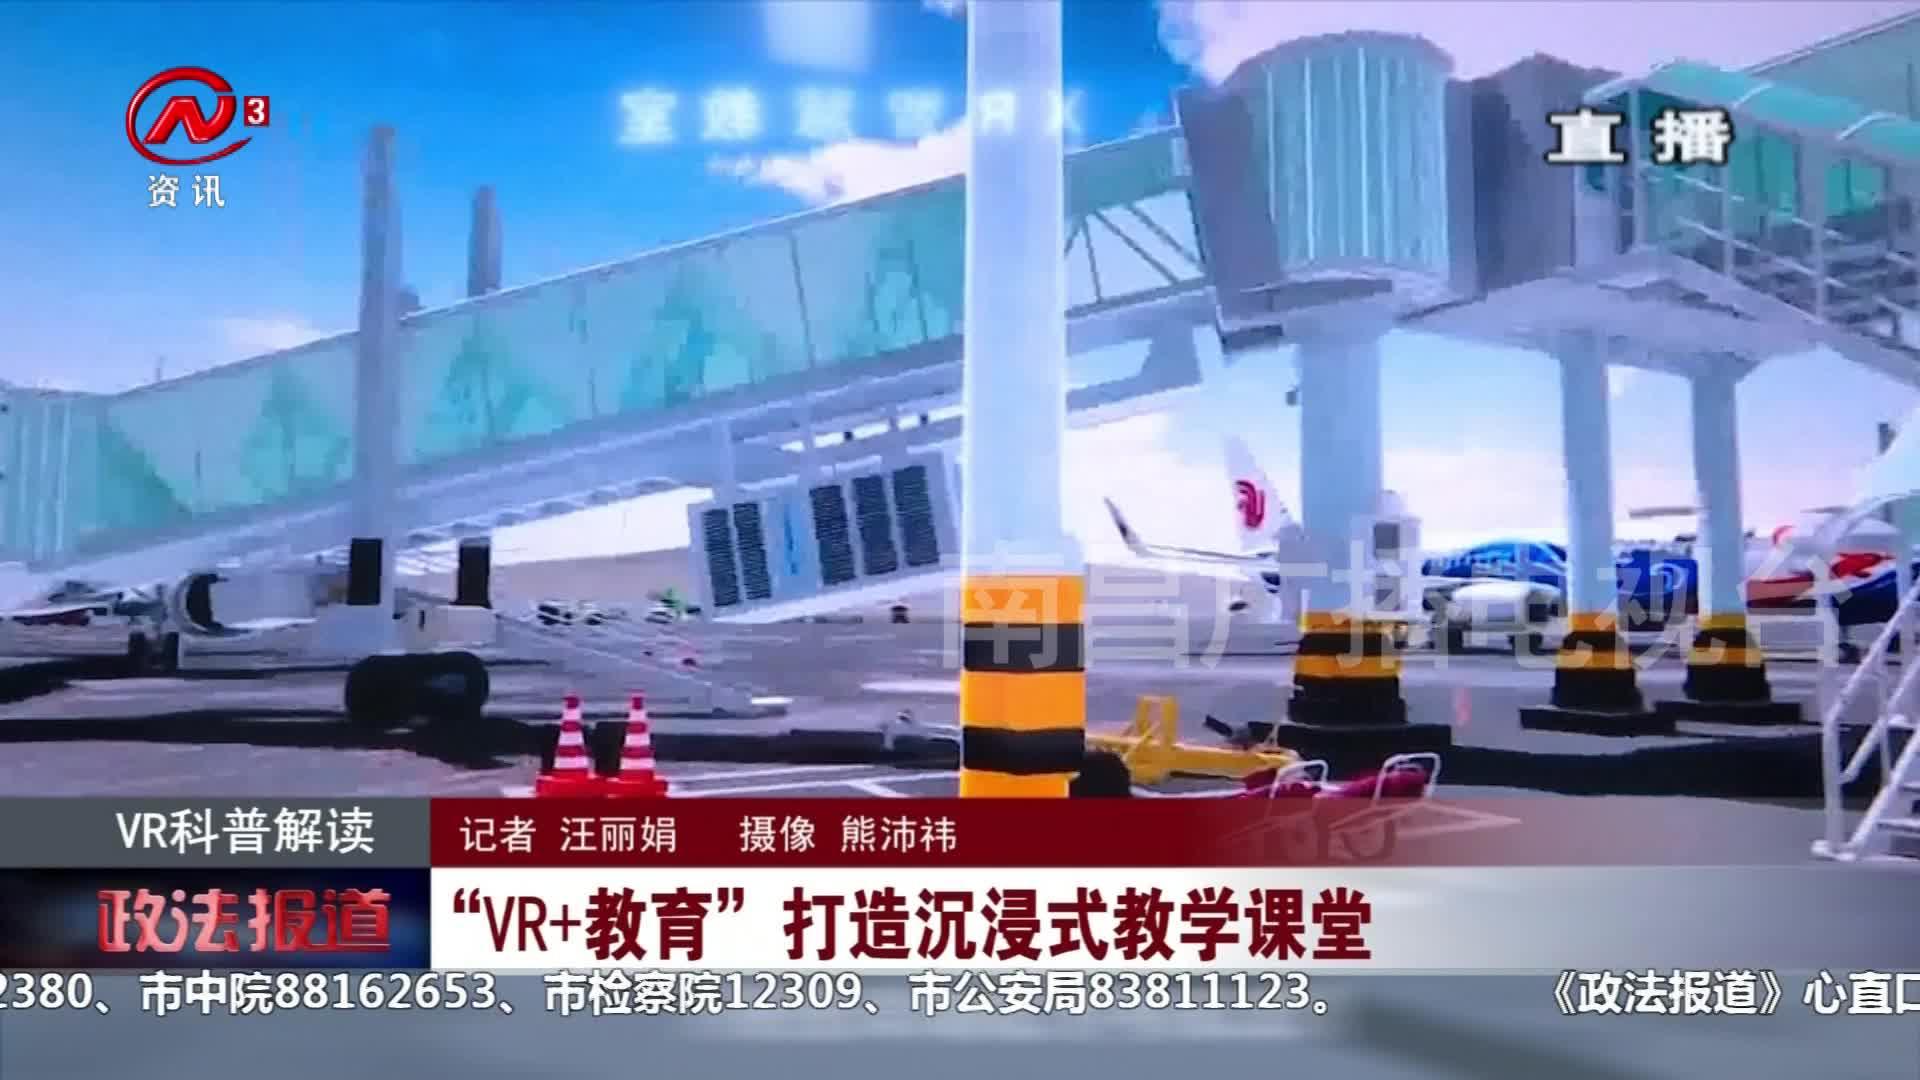 """VR+教育""打造沉浸式教学课堂"